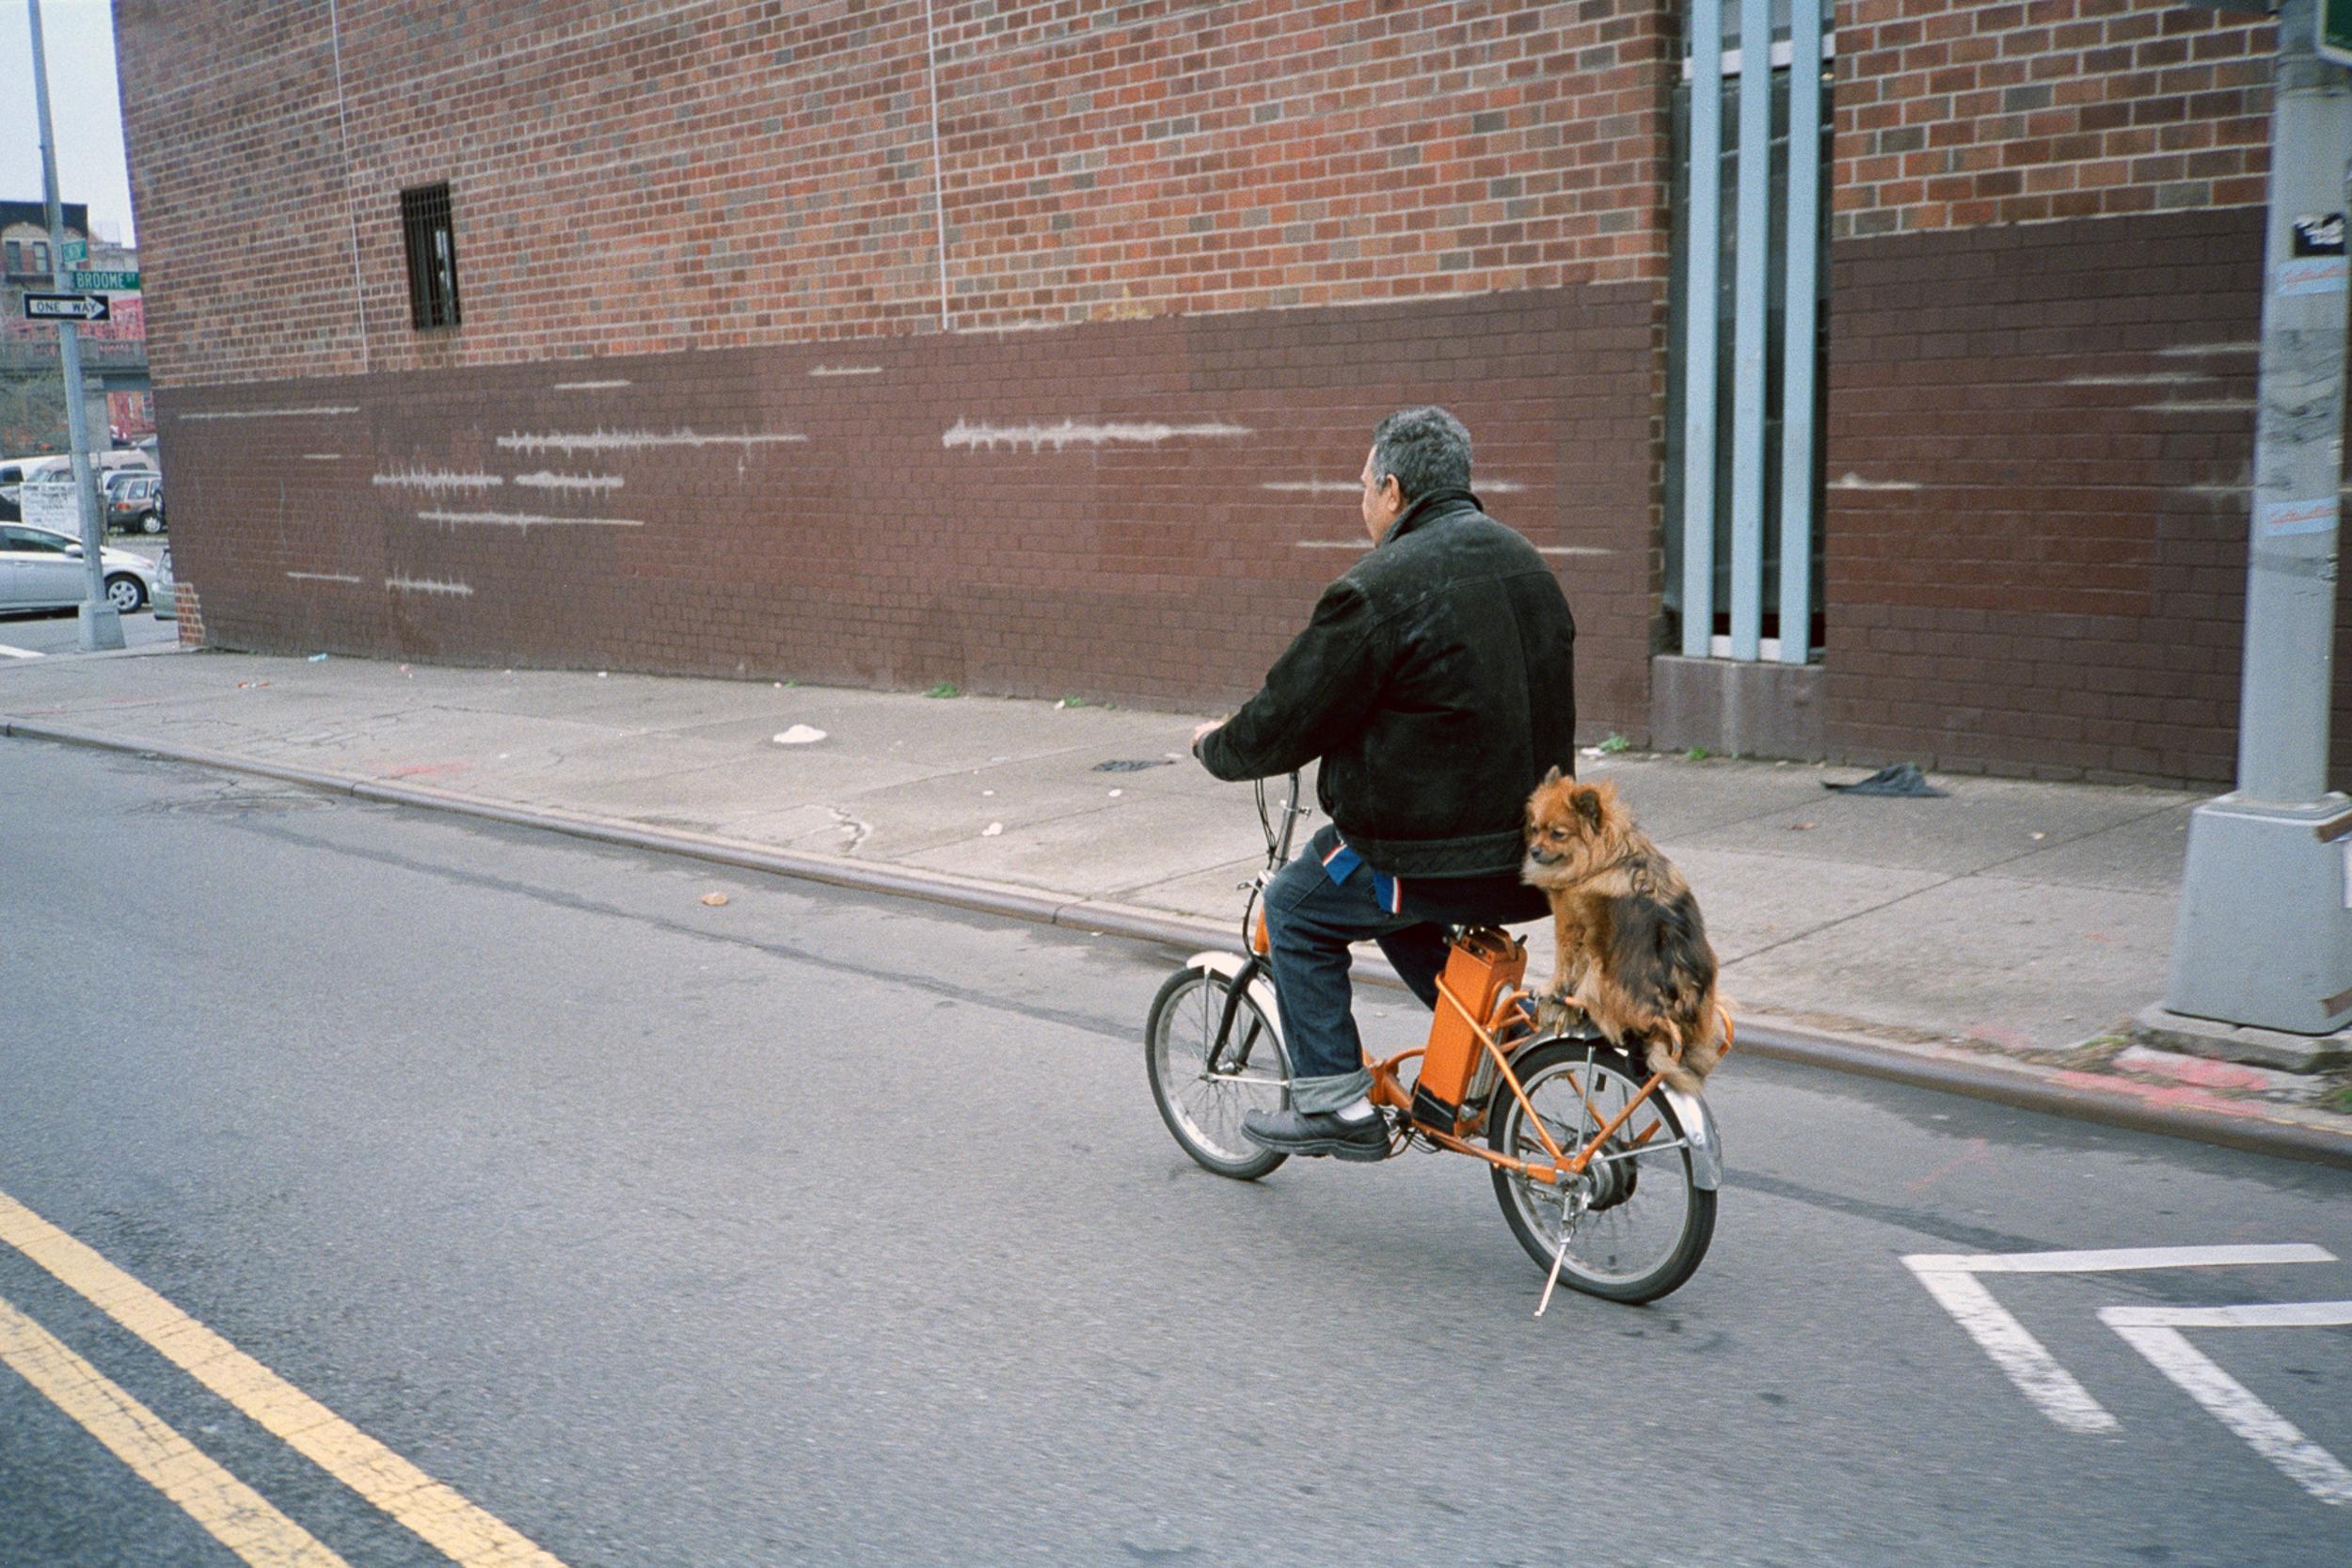 ScottMarceau_dog on bike